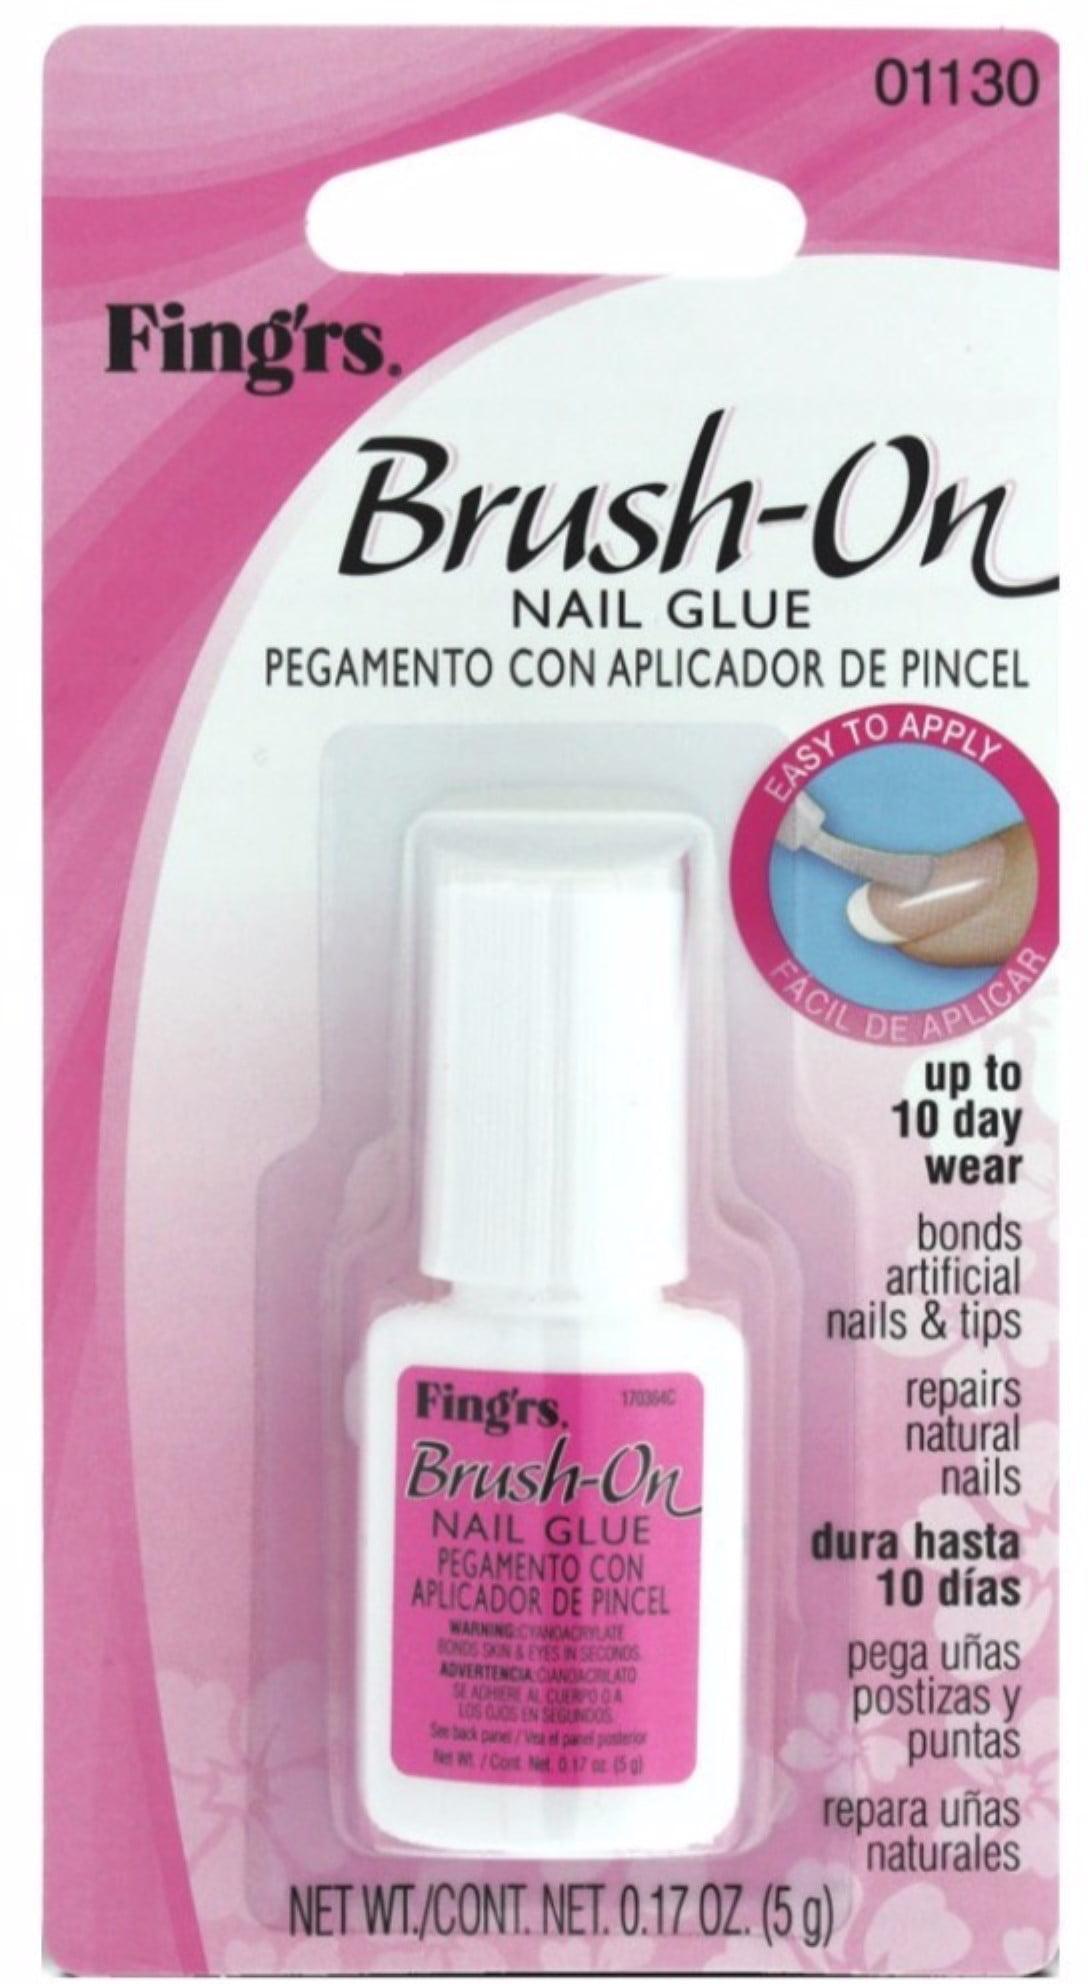 Fing\'rs Brush-On Nail Glue, 1130, 0.18 oz - Walmart.com